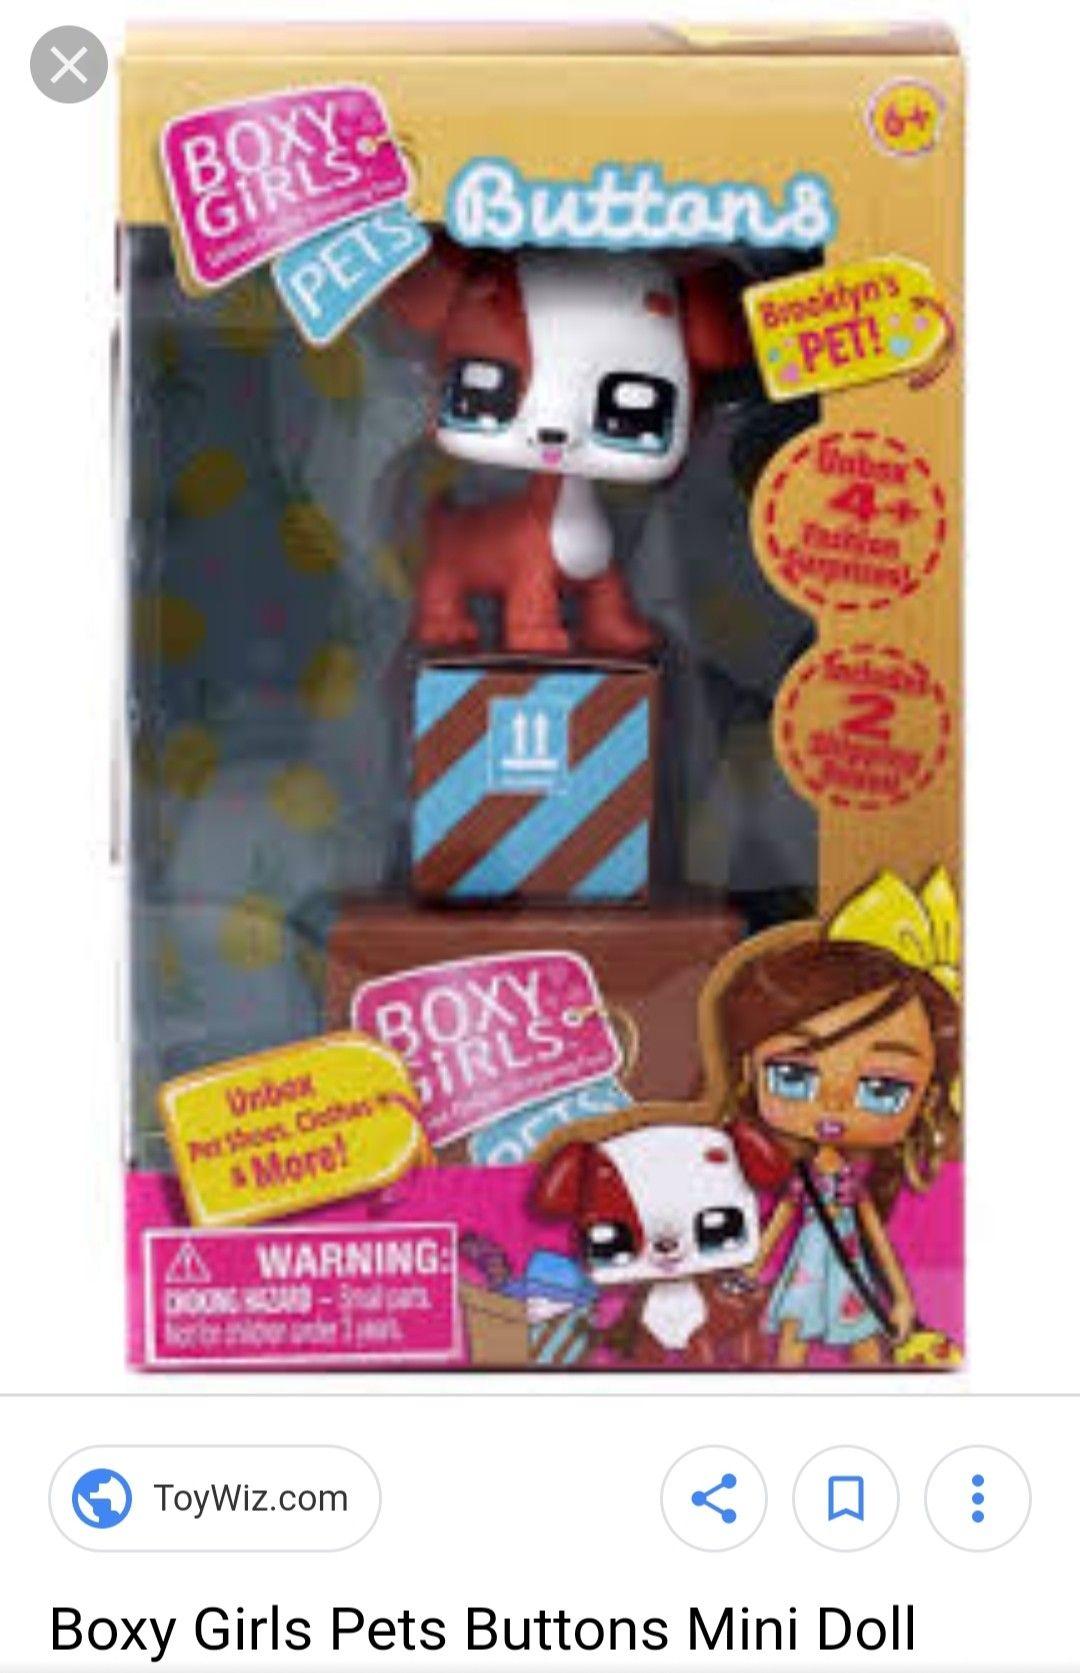 Boxy Girls JUMBO CRATE Big Box 2 LIMITED EDITION DOLLS 28 Surprise Boxes New!